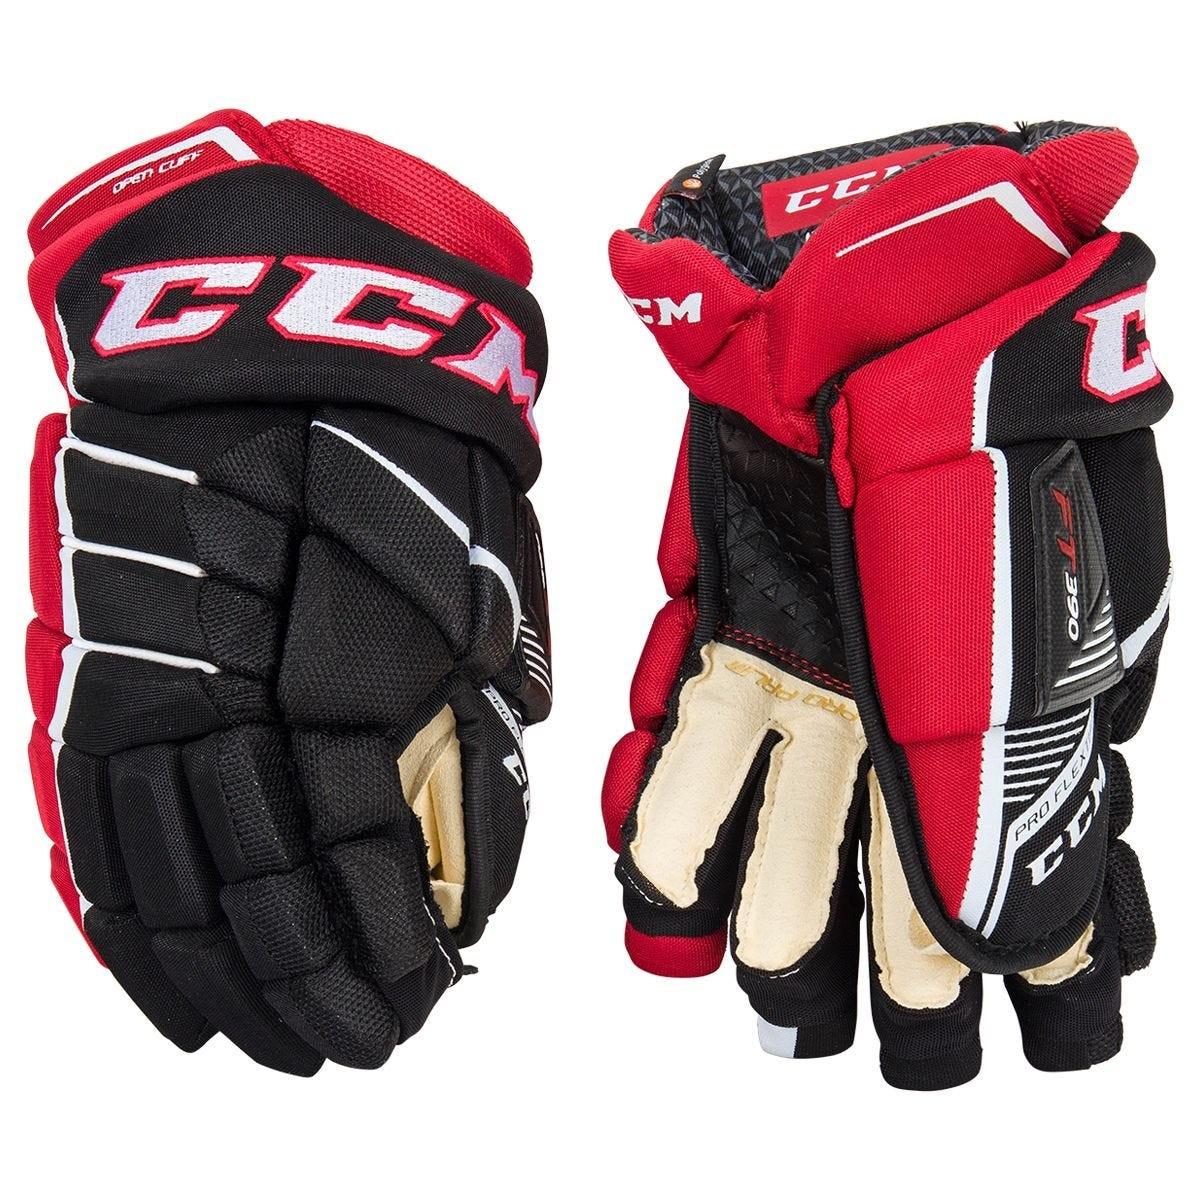 CCM Jetspeed FT390 Senior Ice Hockey Gloves